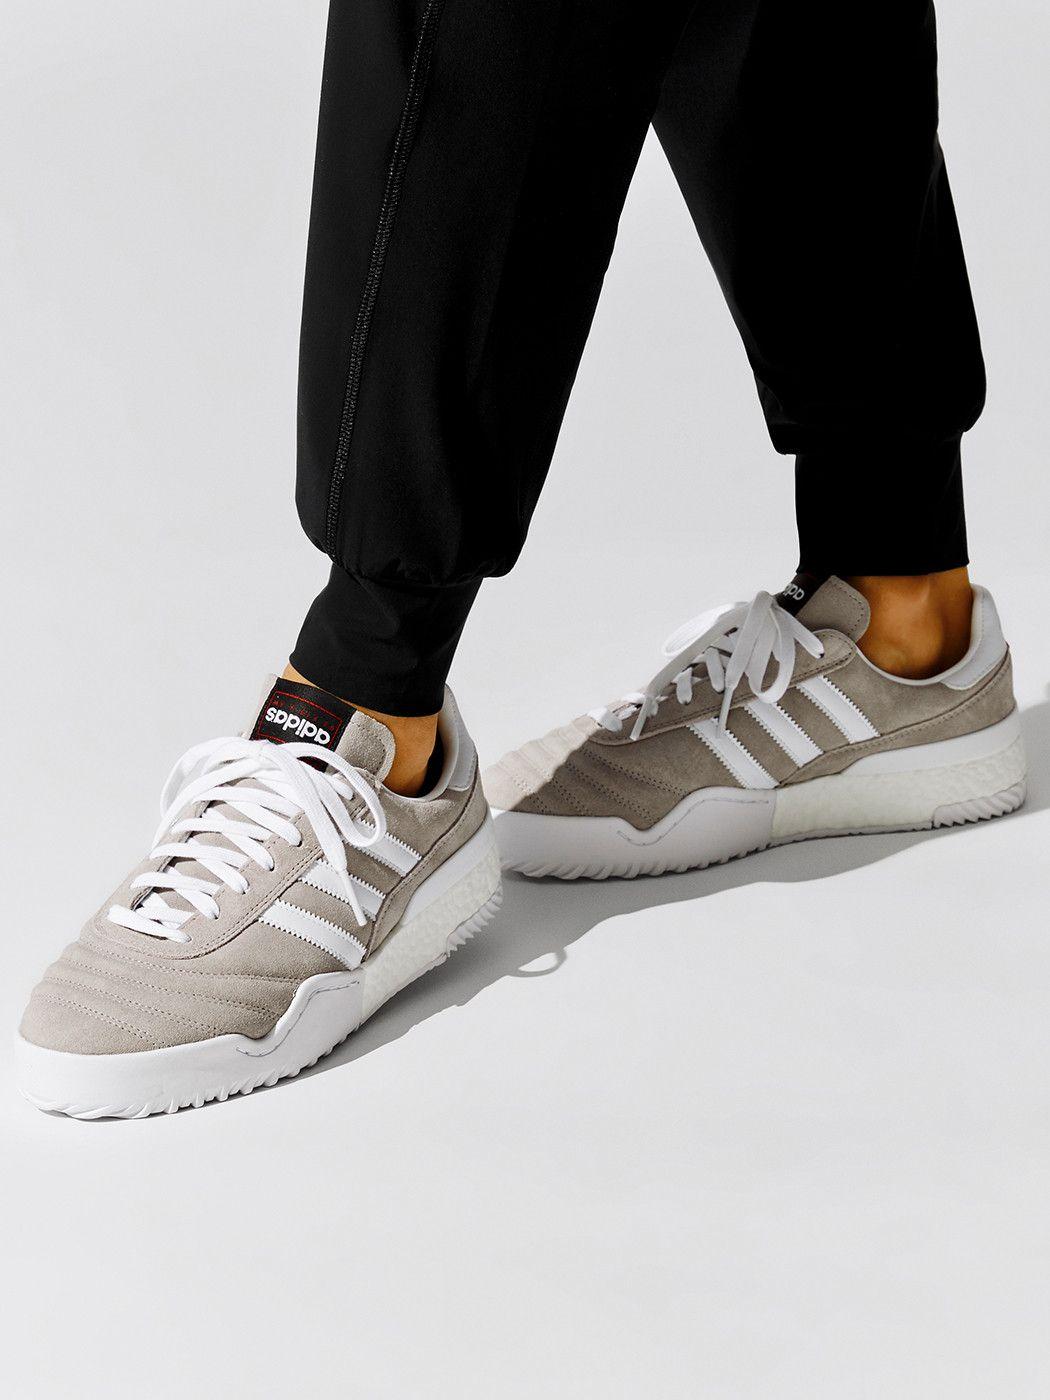 Soccer shoes, Stella mccartney adidas